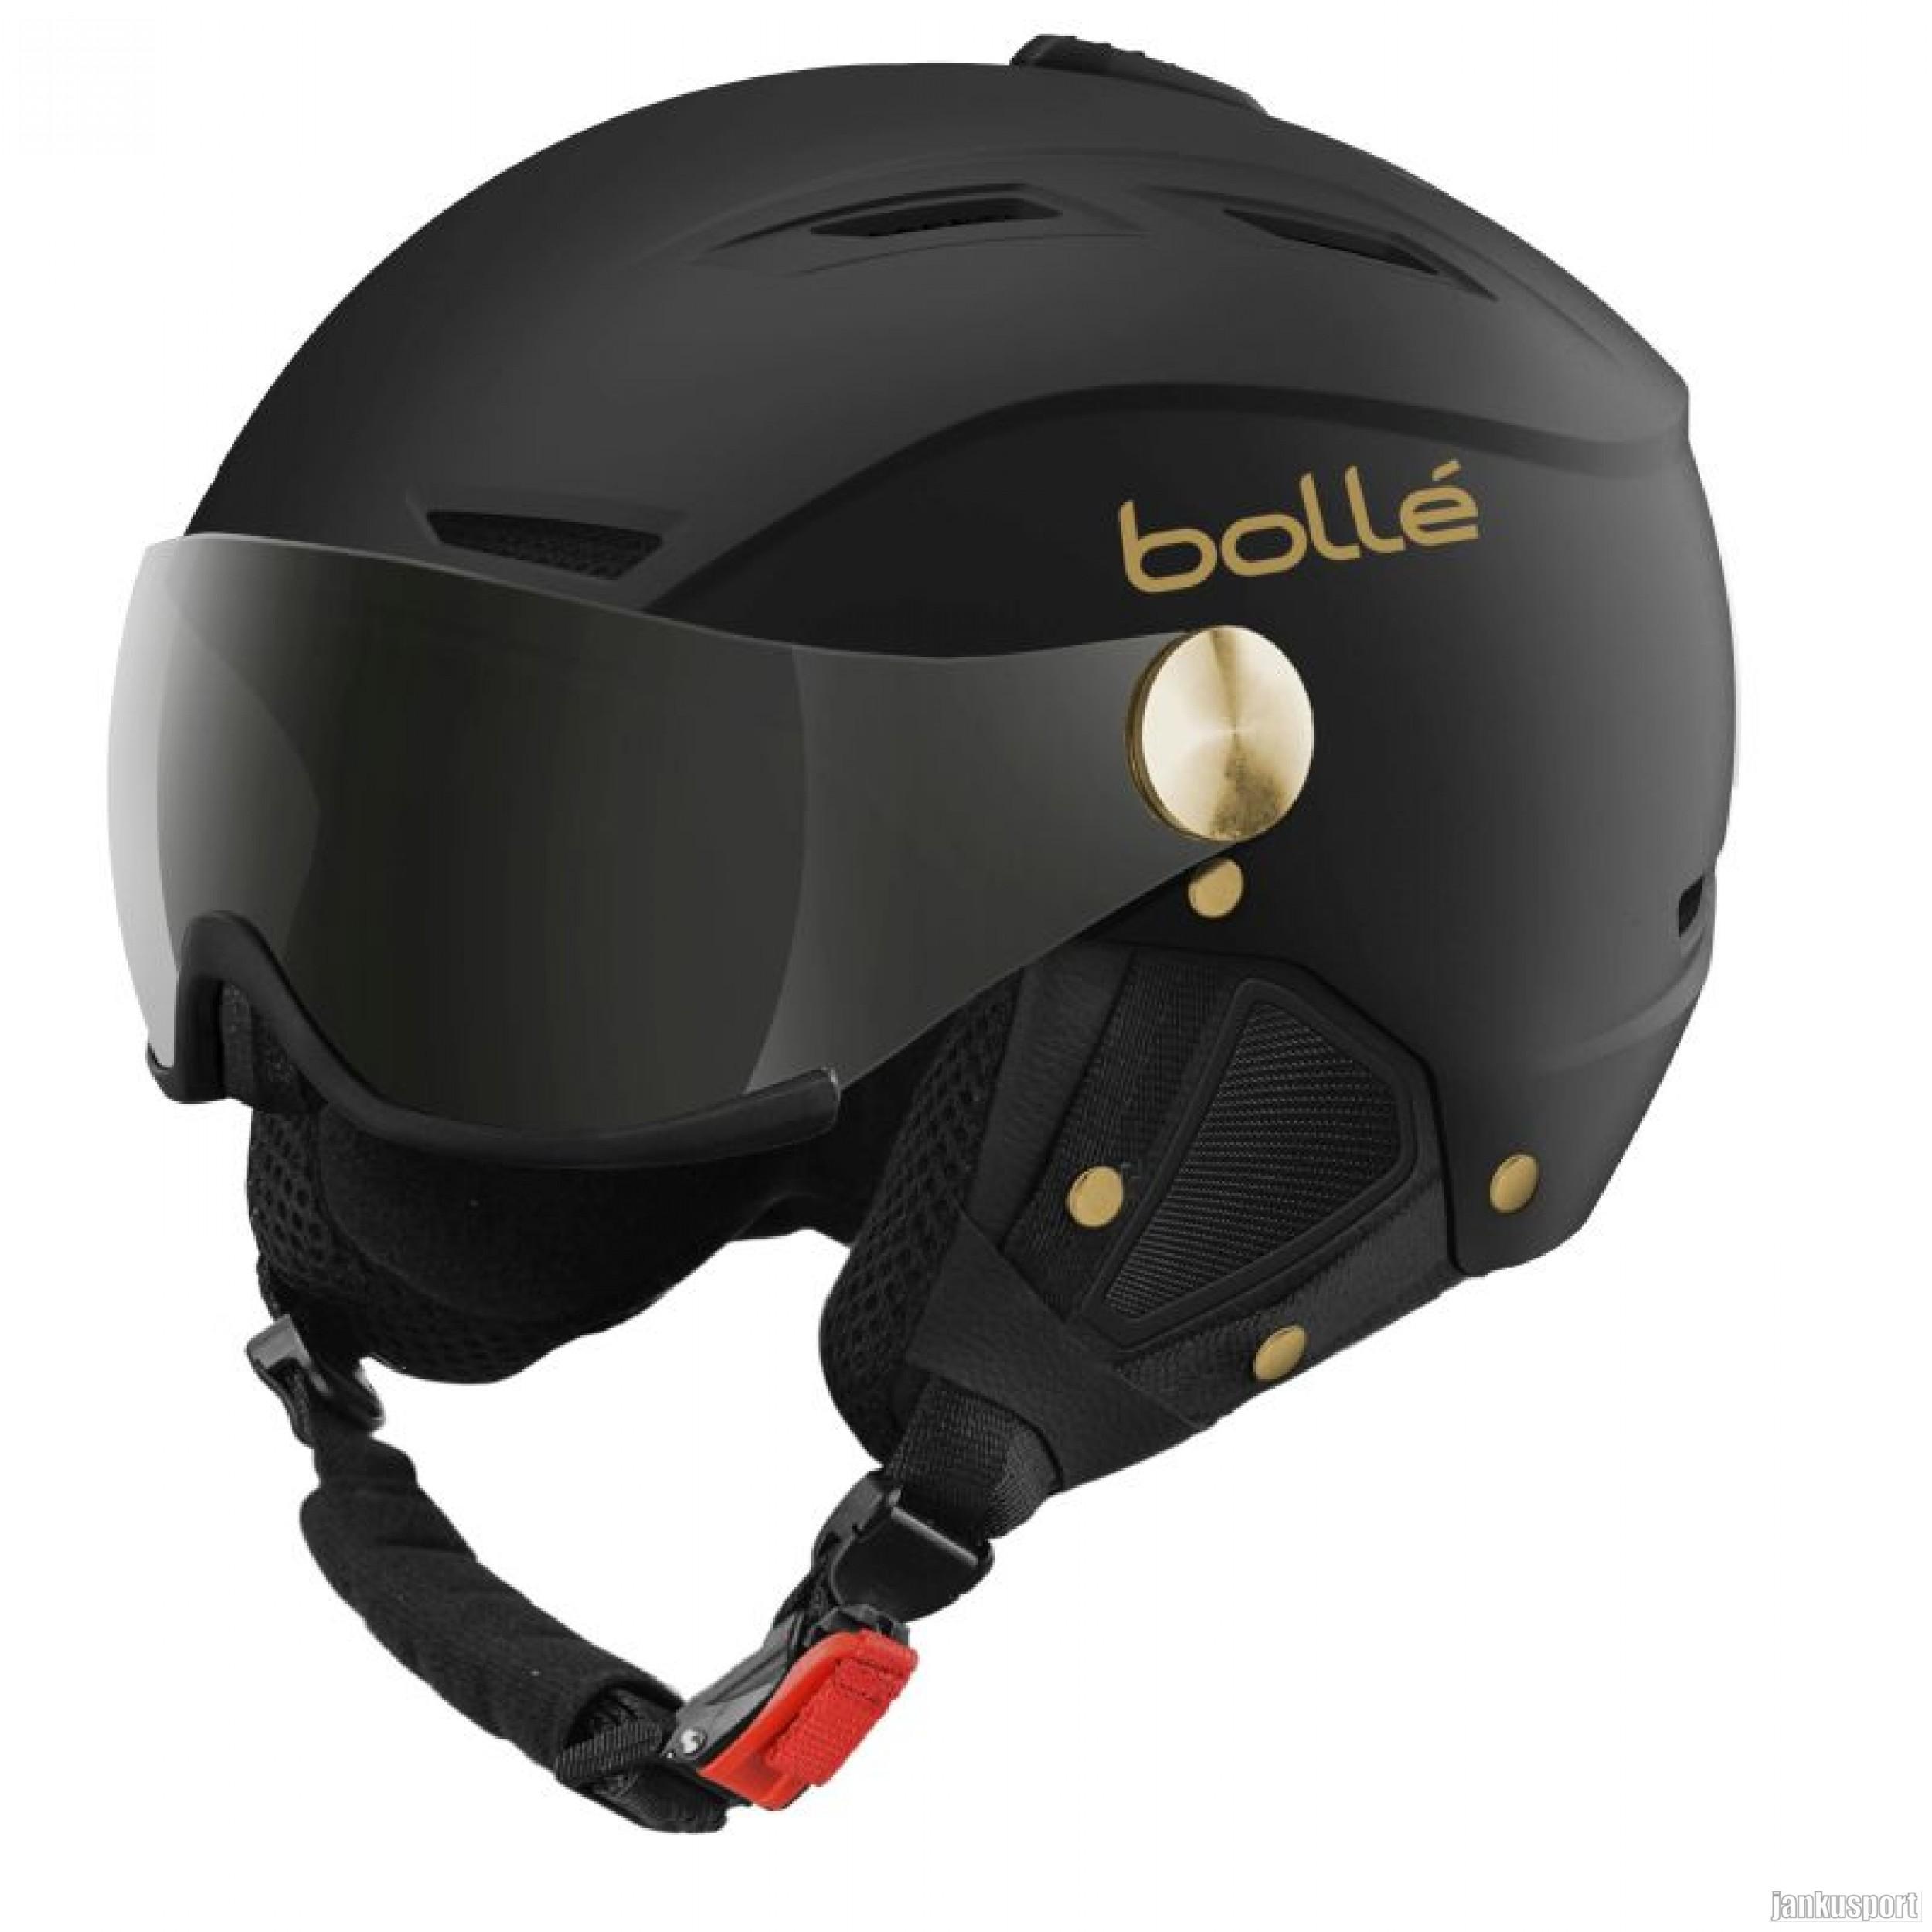 BOLLE BACKLINE VISOR (Lyžařská přilba Bolle)